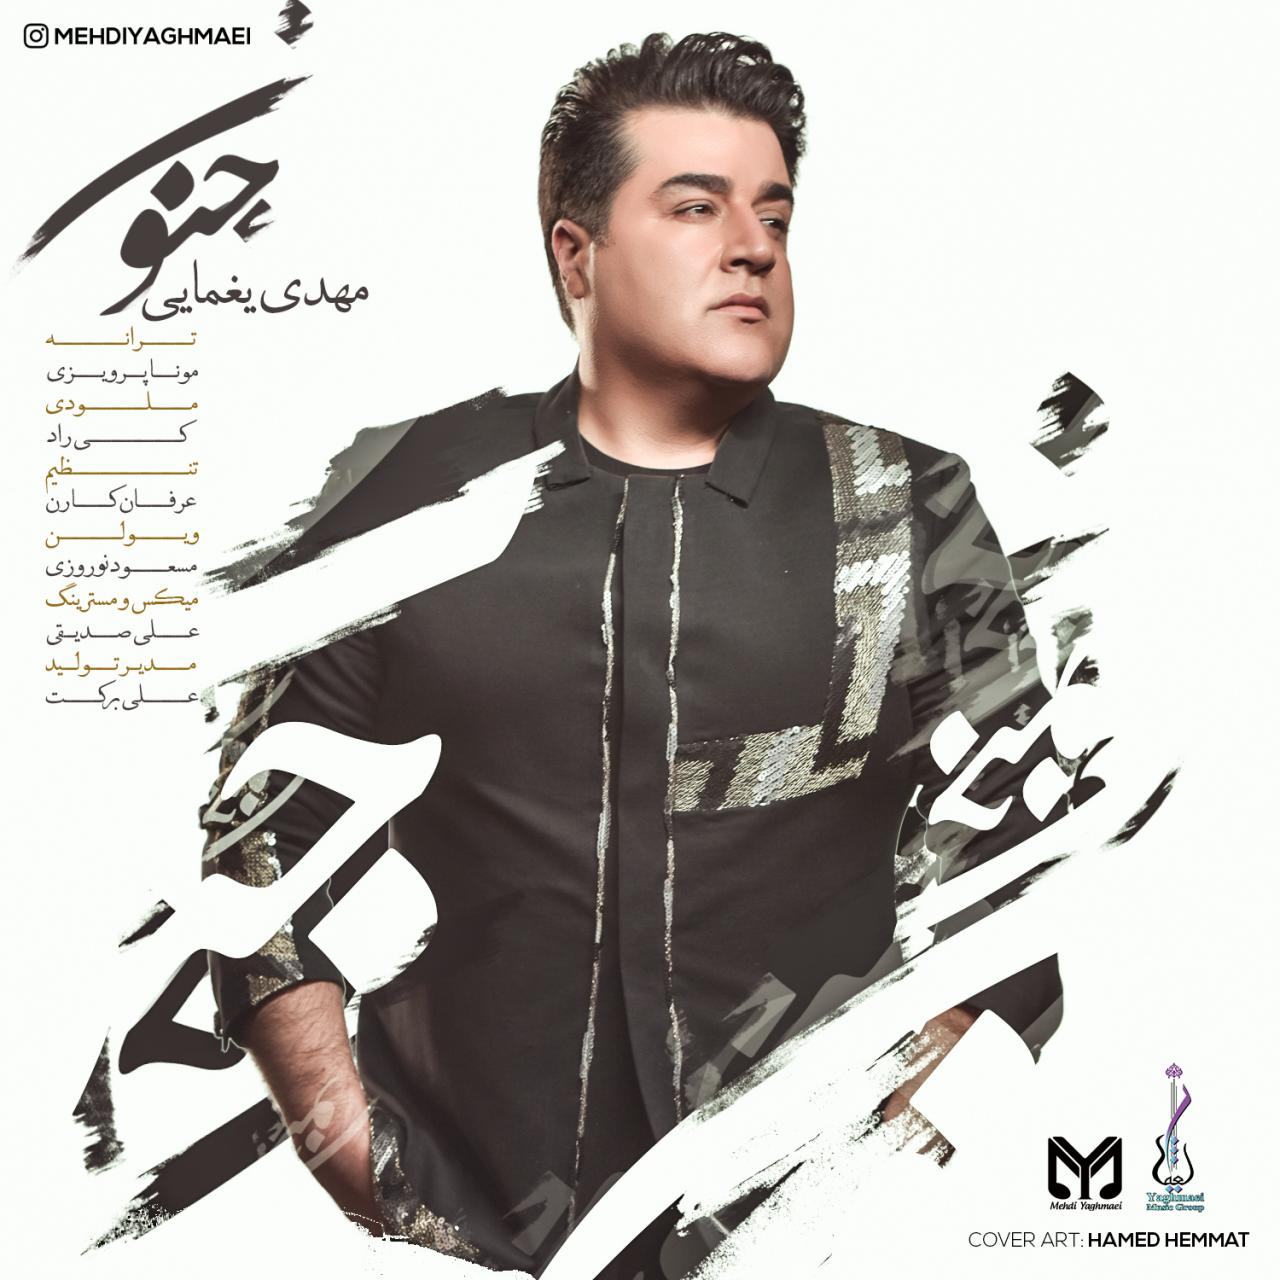 Mehdi Yaghmaei - Jonoon - دانلود آهنگ مهدی یغمایی به نام جنون